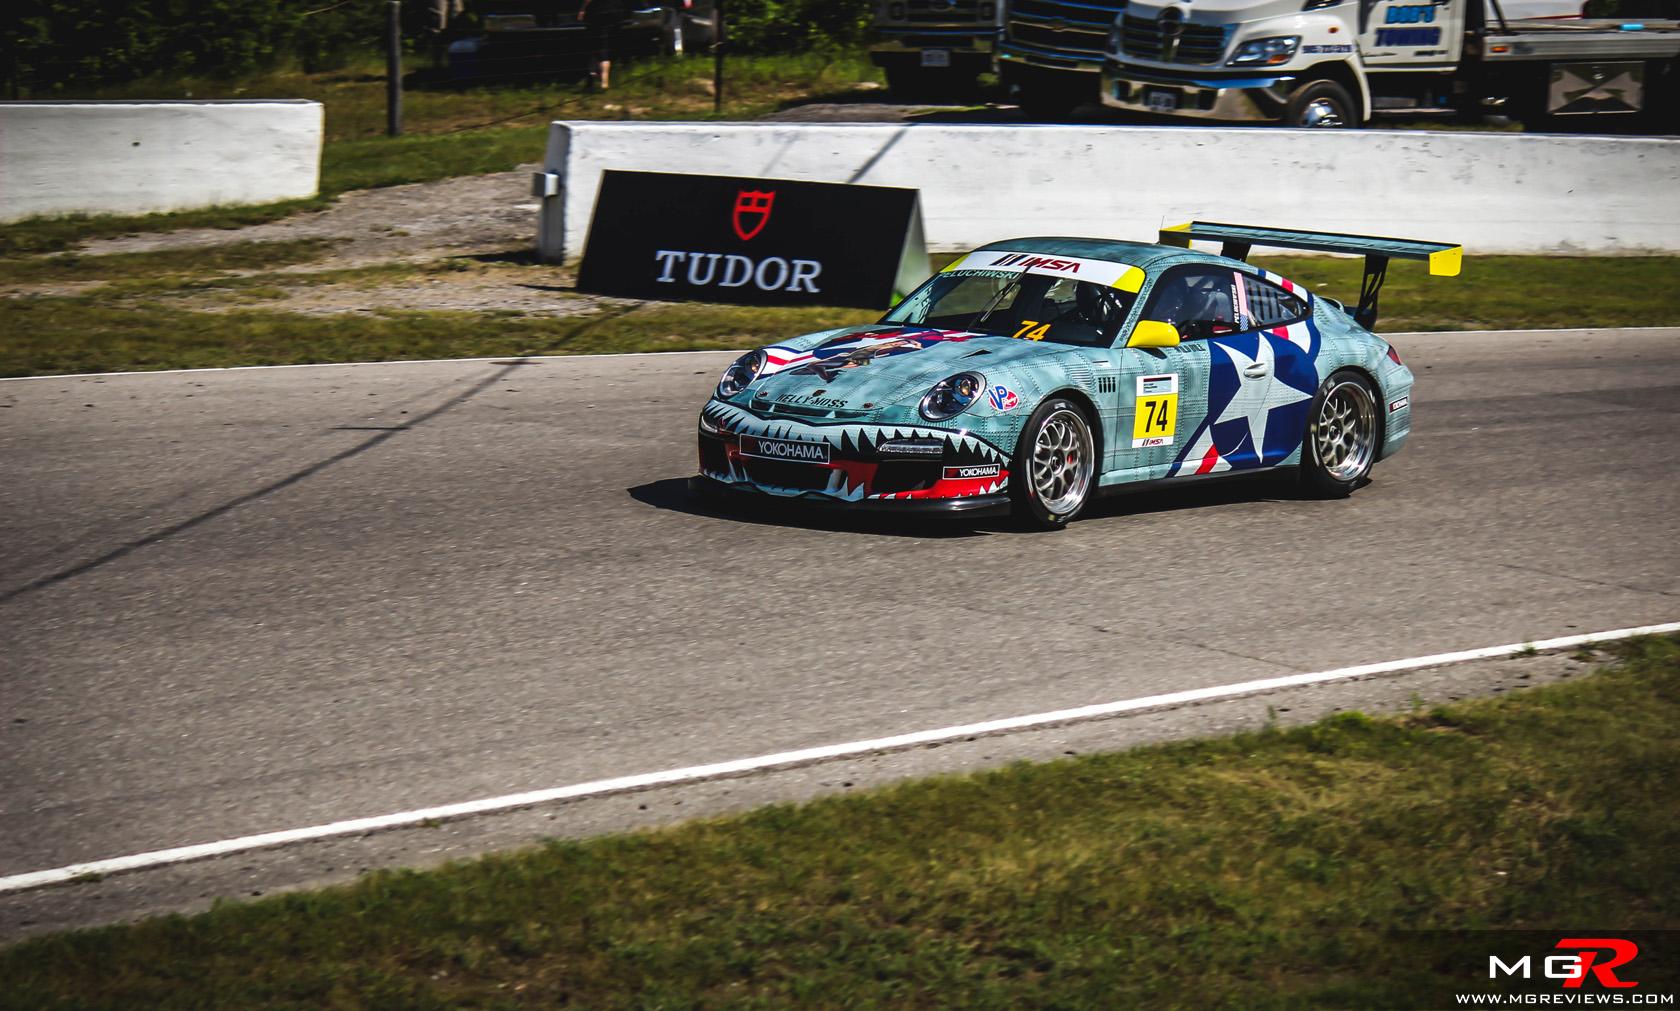 Photos Porsche 911 Gt3 Cup M G Reviews